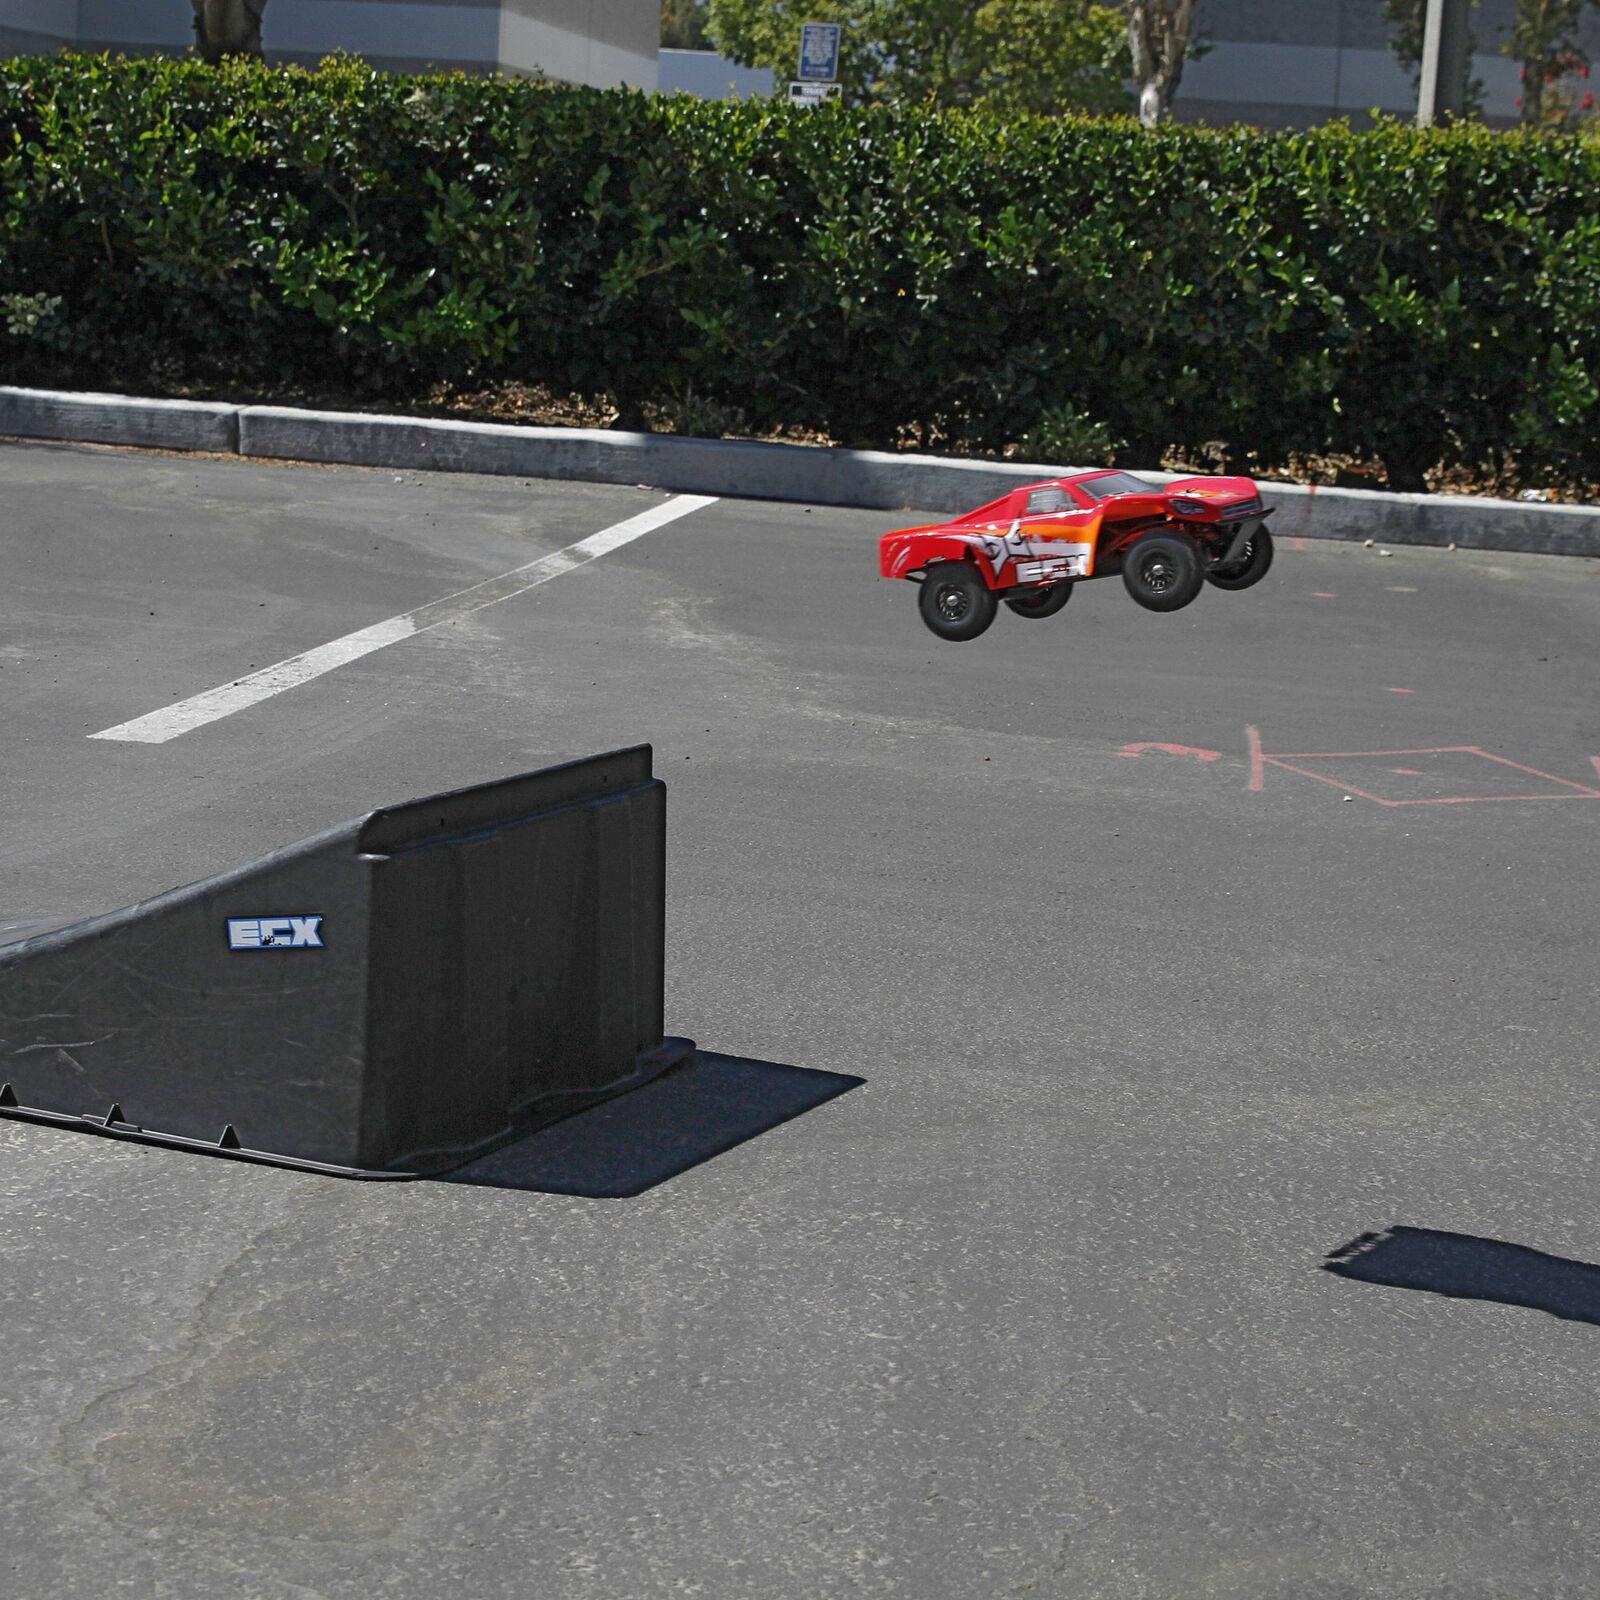 1/18 Torment 4WD SCT RTR, Red/Orange